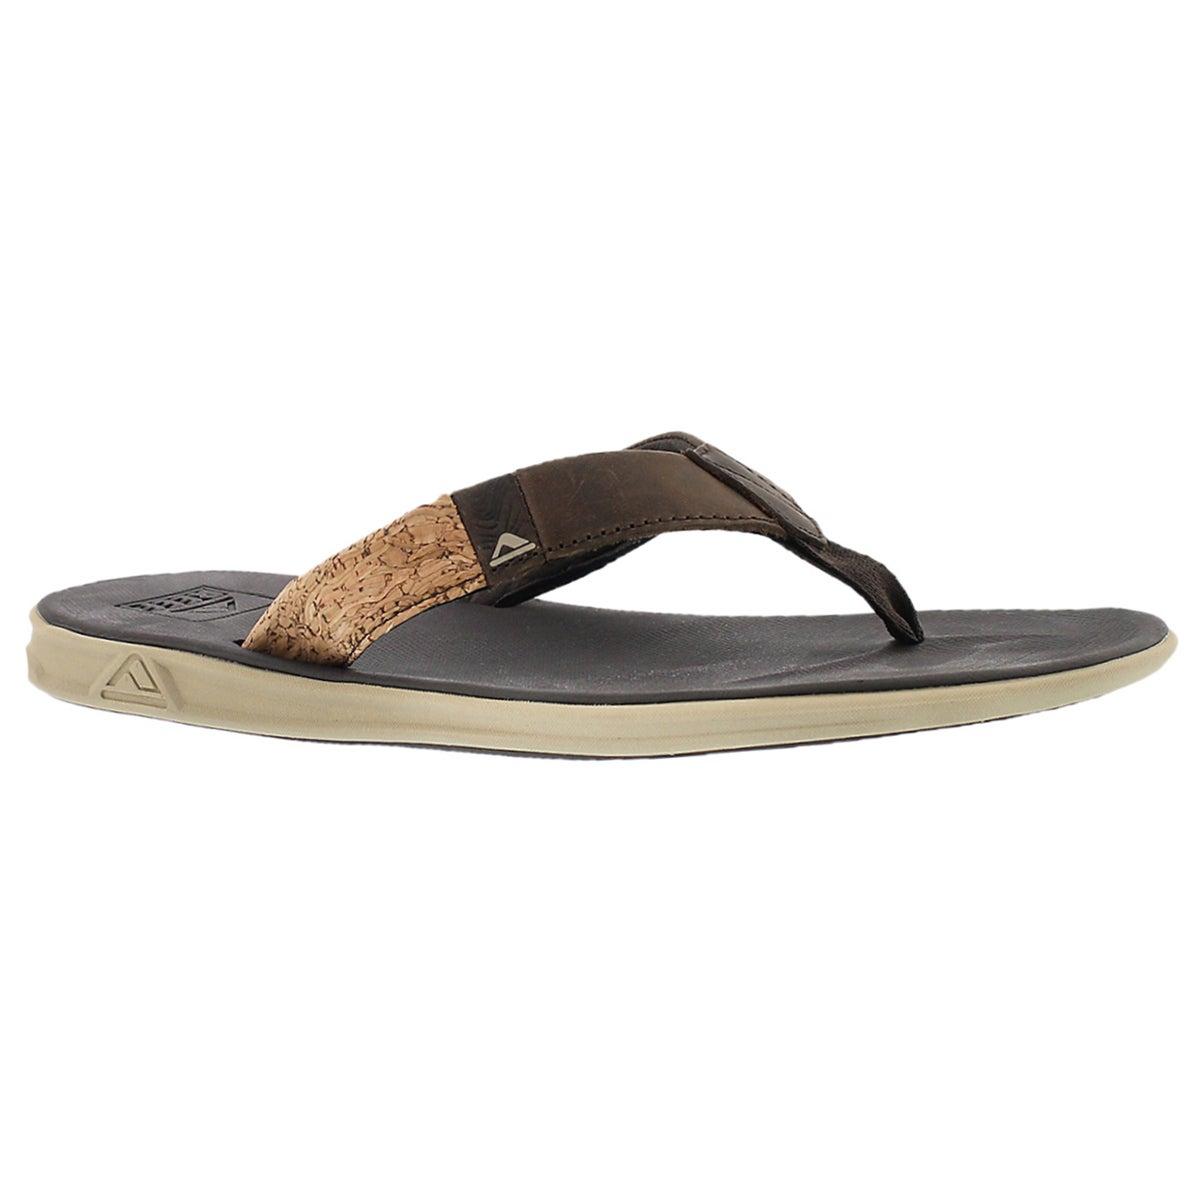 Mns Slammed Rover LE brn thong sandal